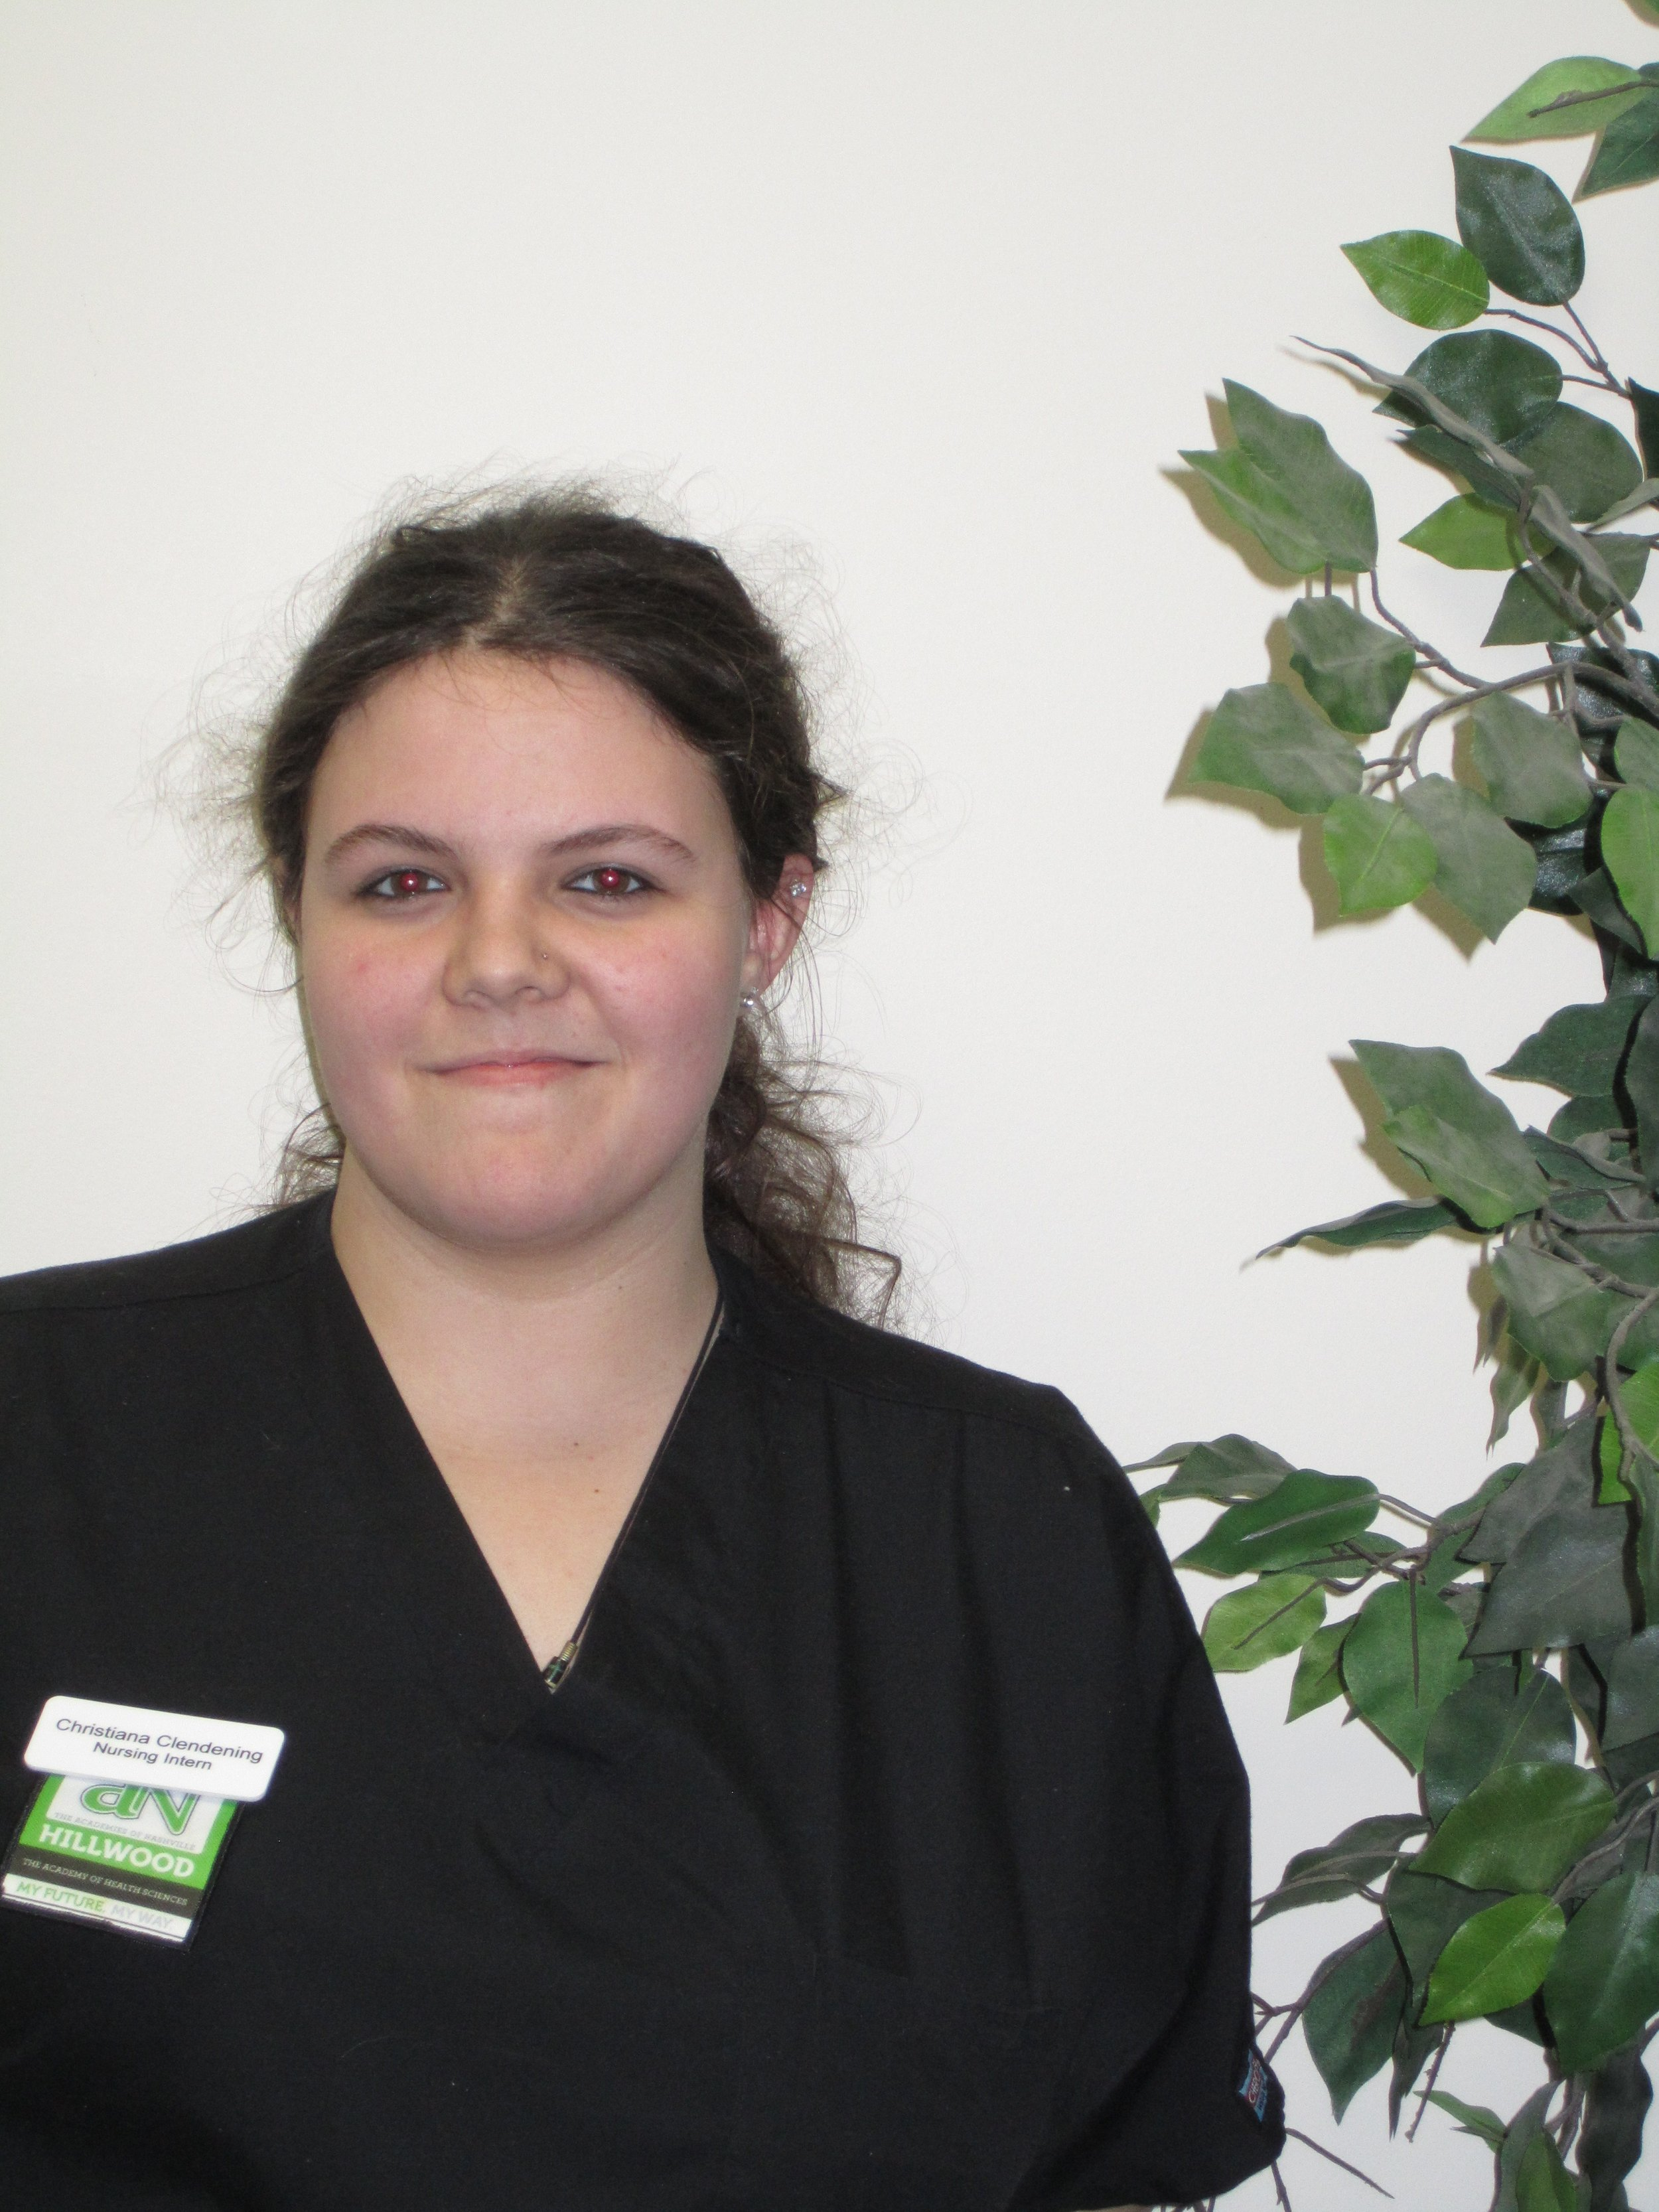 Hillwood Academies Nashville nurse training